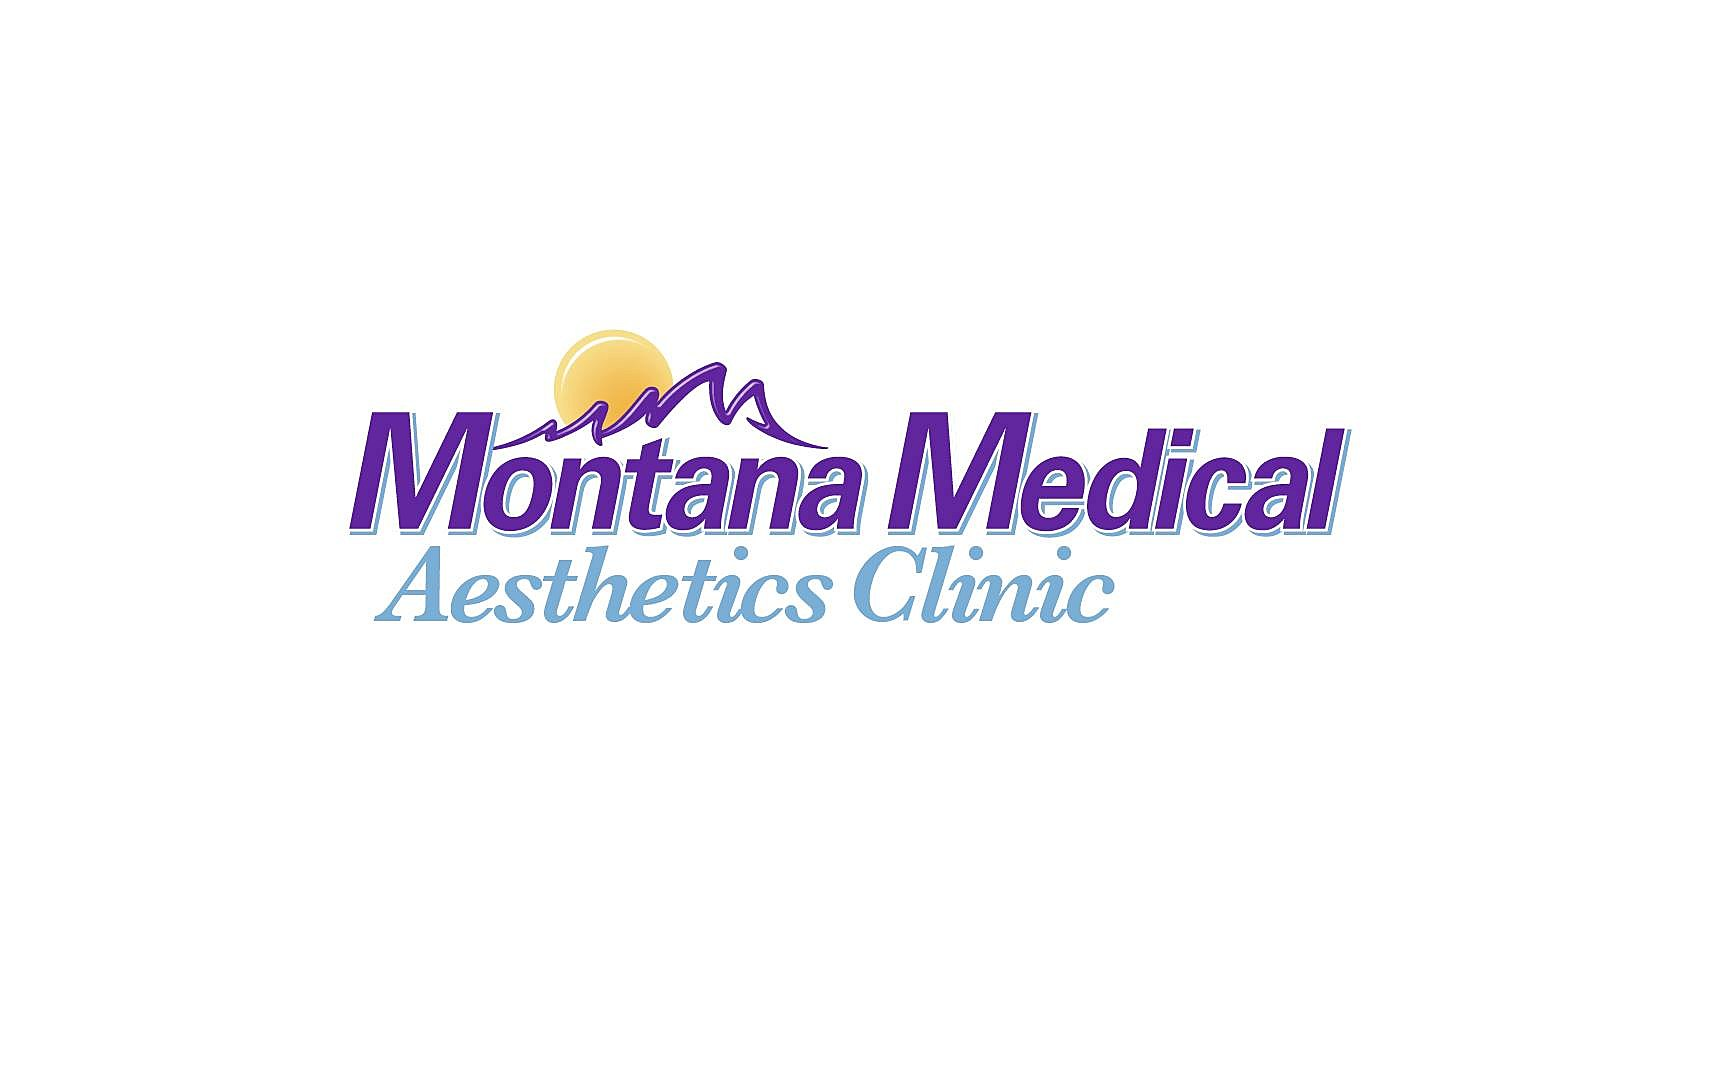 Montana Medical Aesthetic Clinic